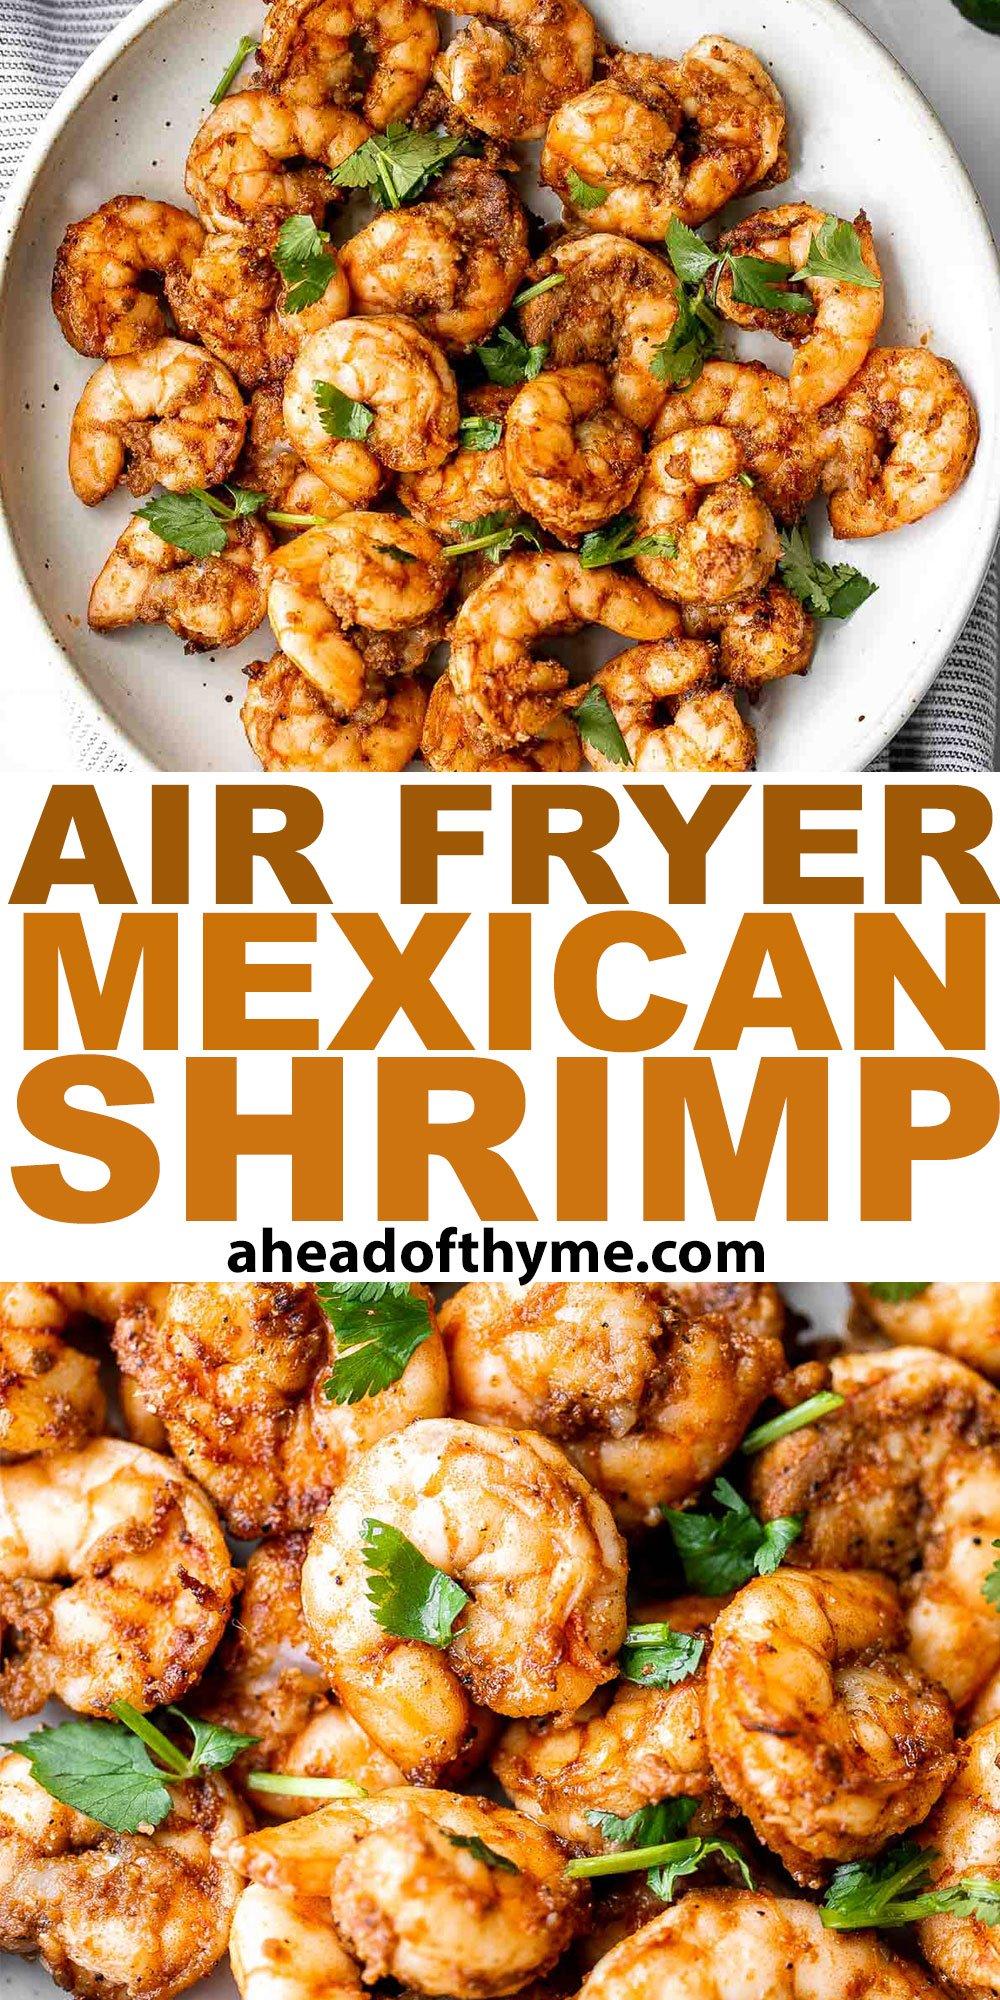 Air Fryer Mexican Shrimp